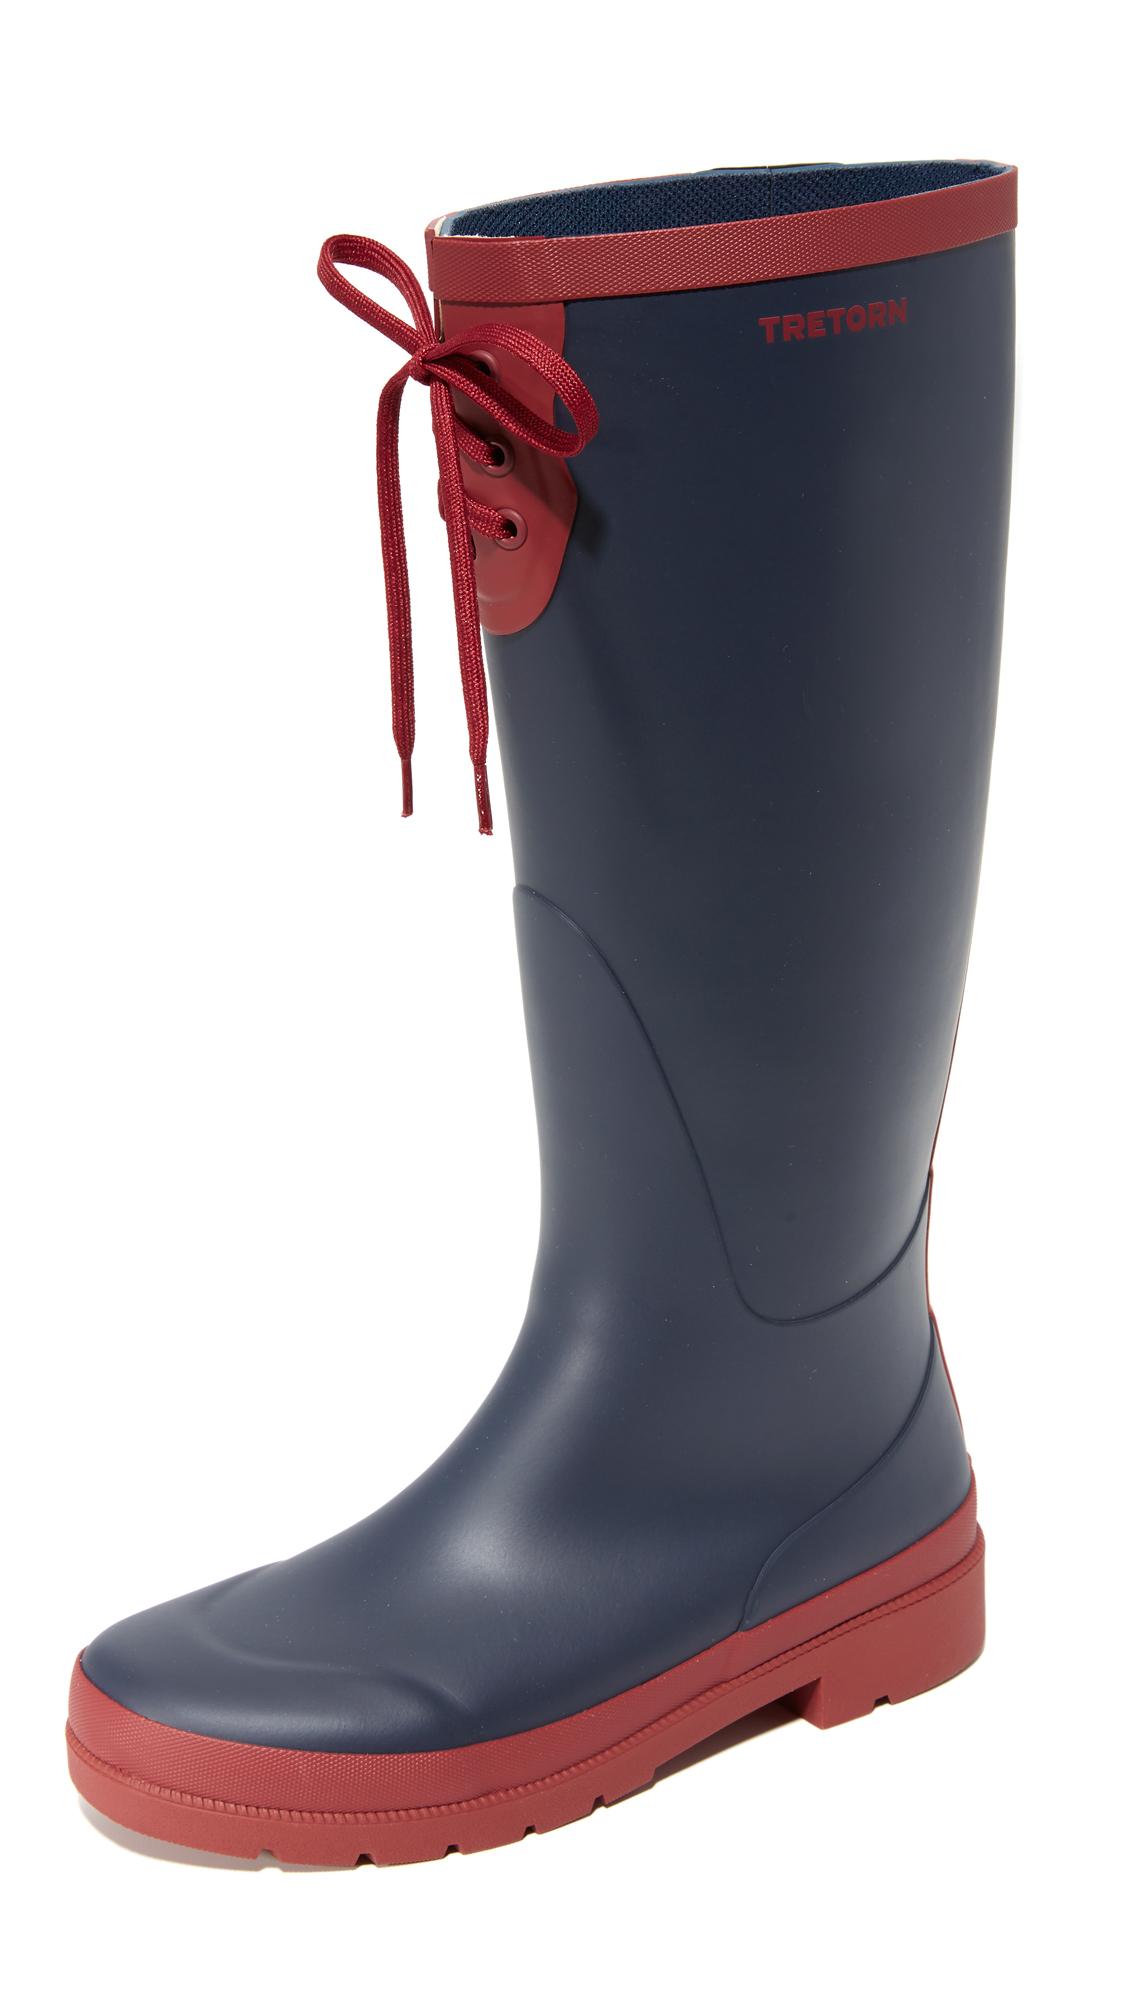 Awesome Tretorn Tretorn Viken Rain Boot | Bluefly.Com